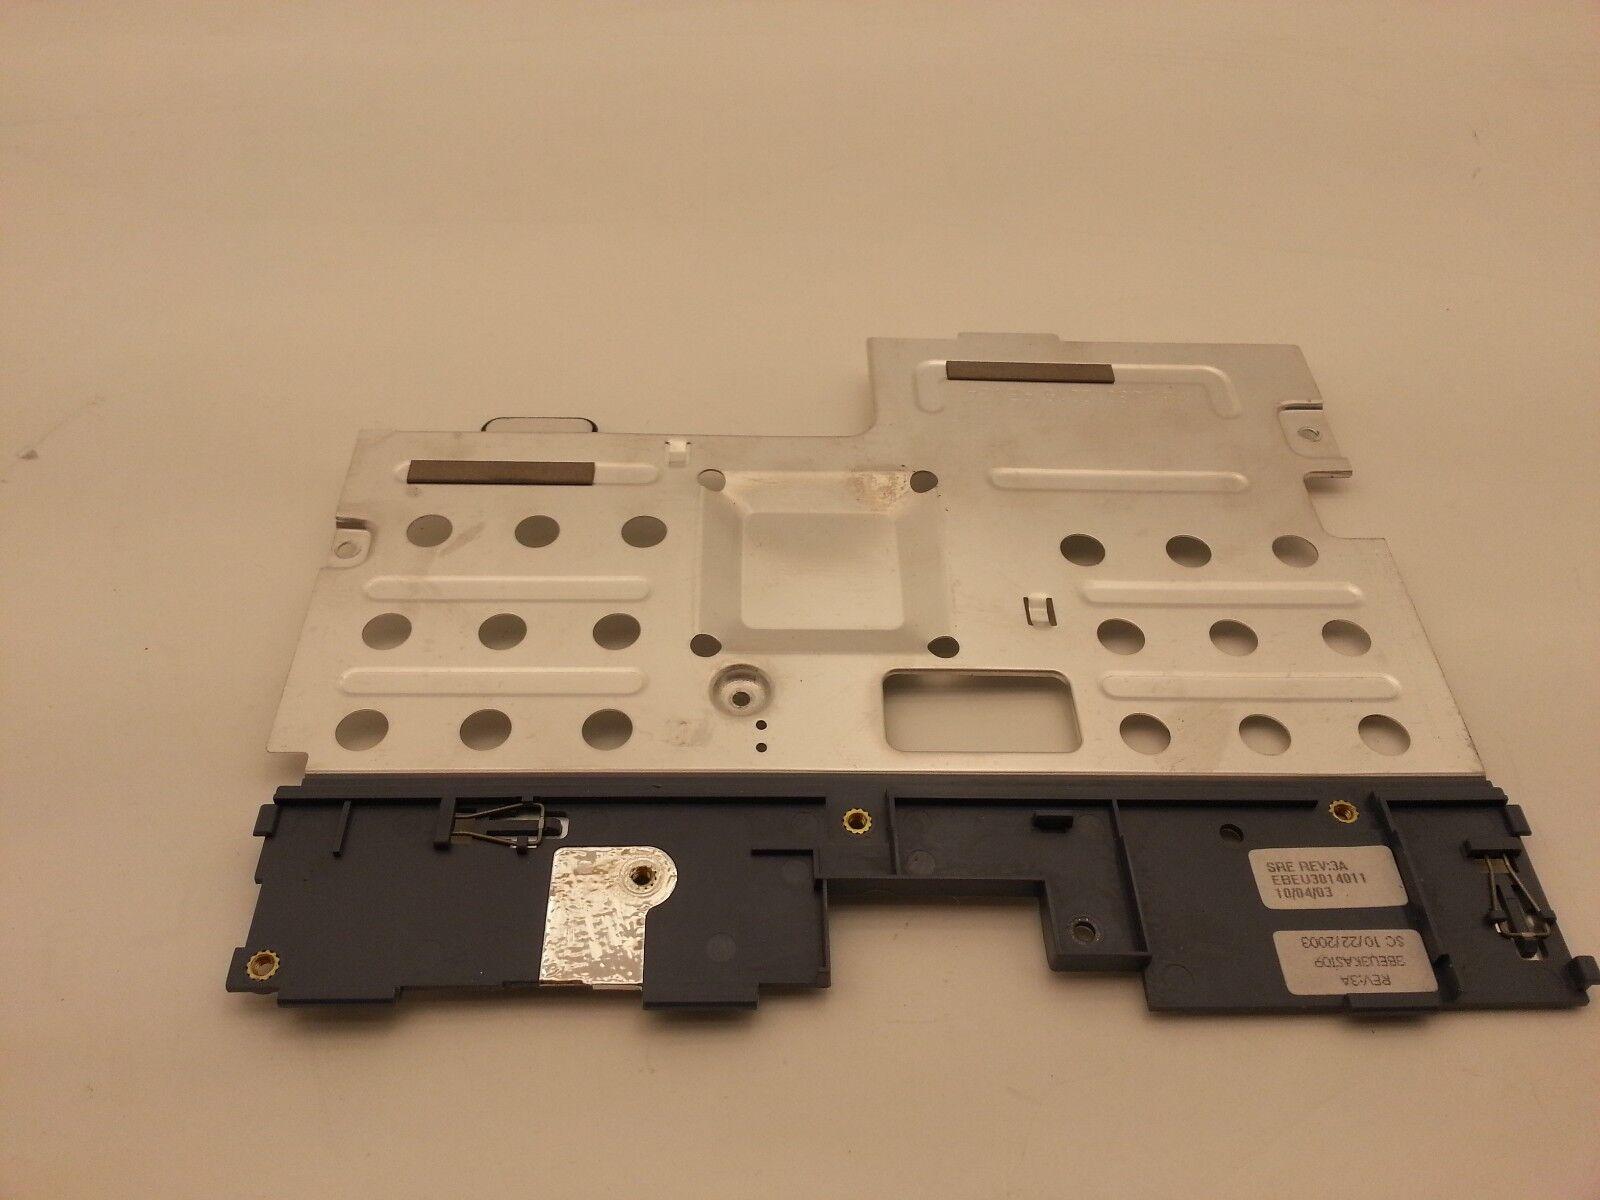 Micron Laptop Notebook MPC TransPort X1000 Video Card Heatsink Cover ebeu3014011